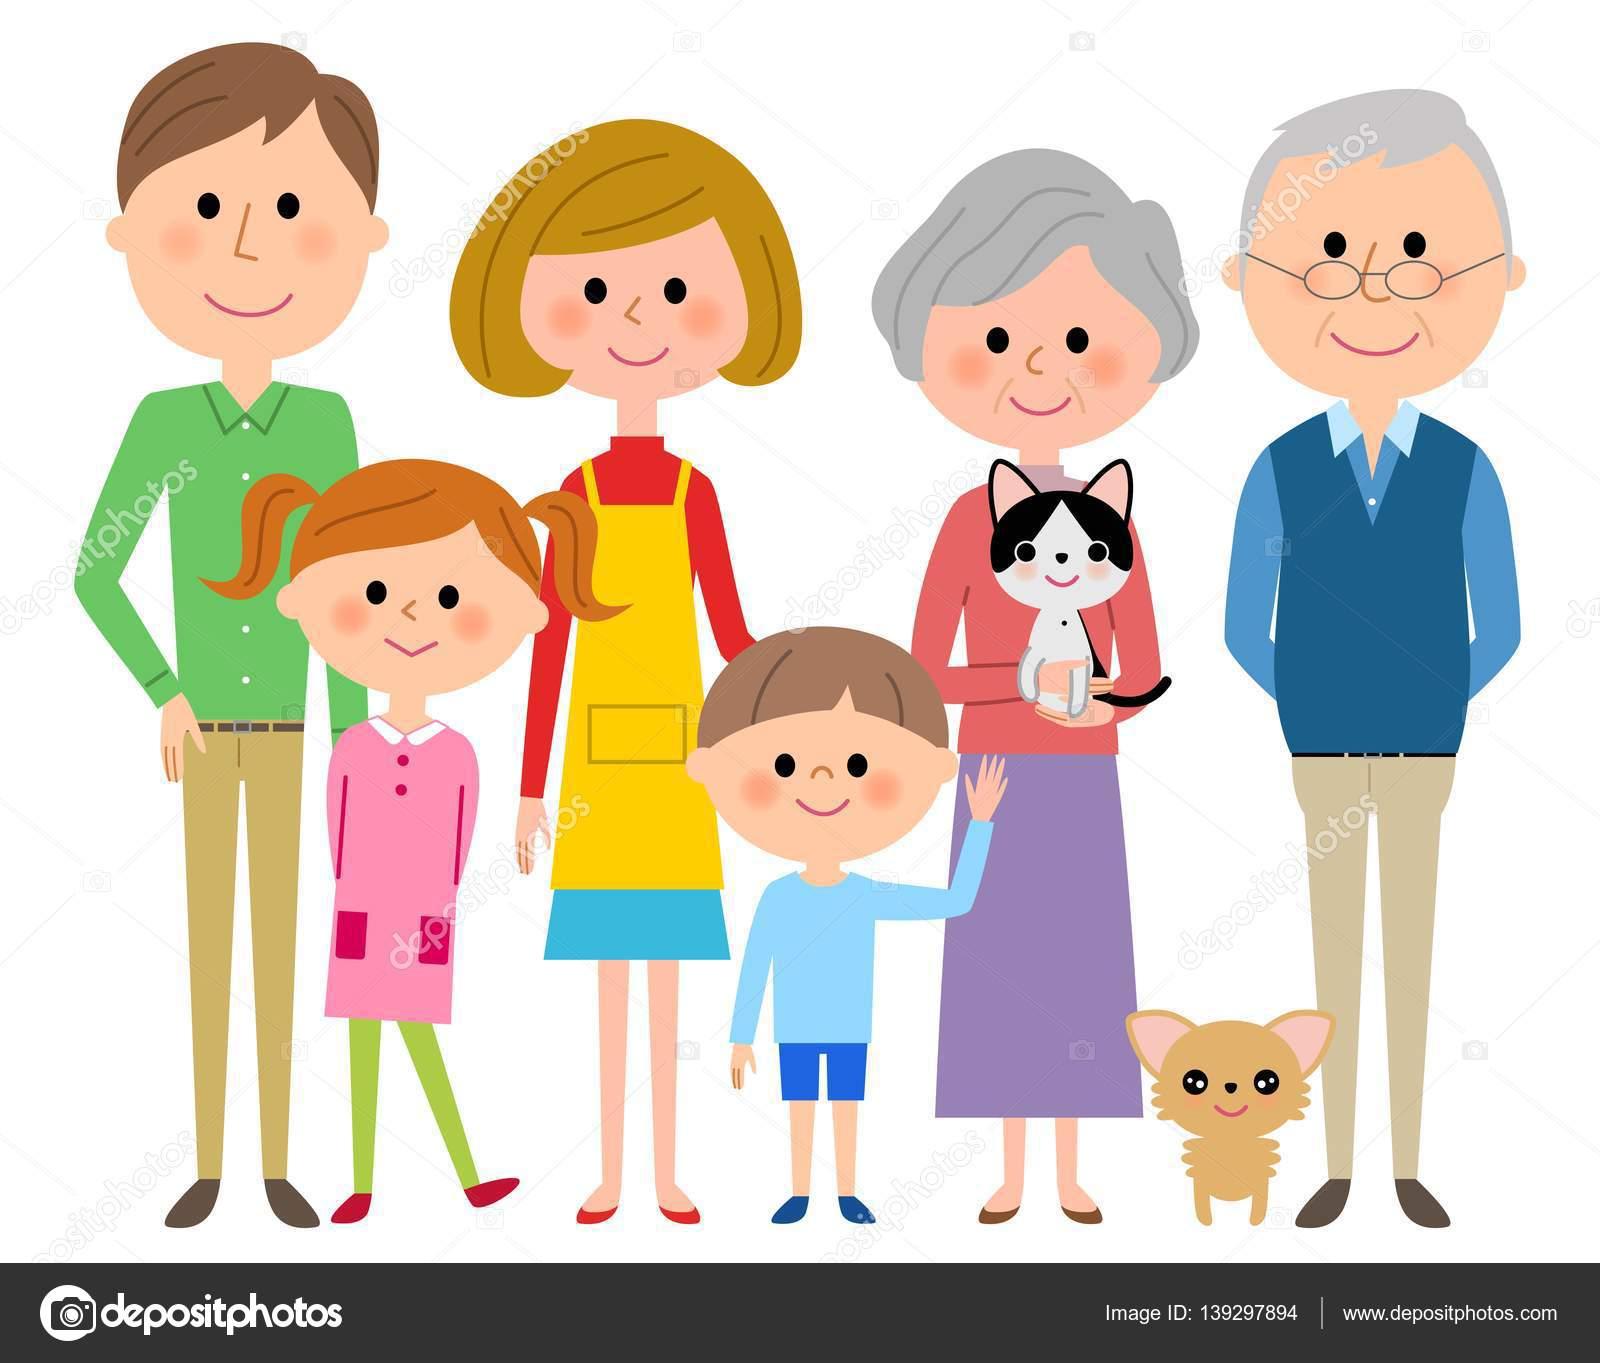 drei generationen familie und haustier stockvektor pet clipart art free pet clipart birthday